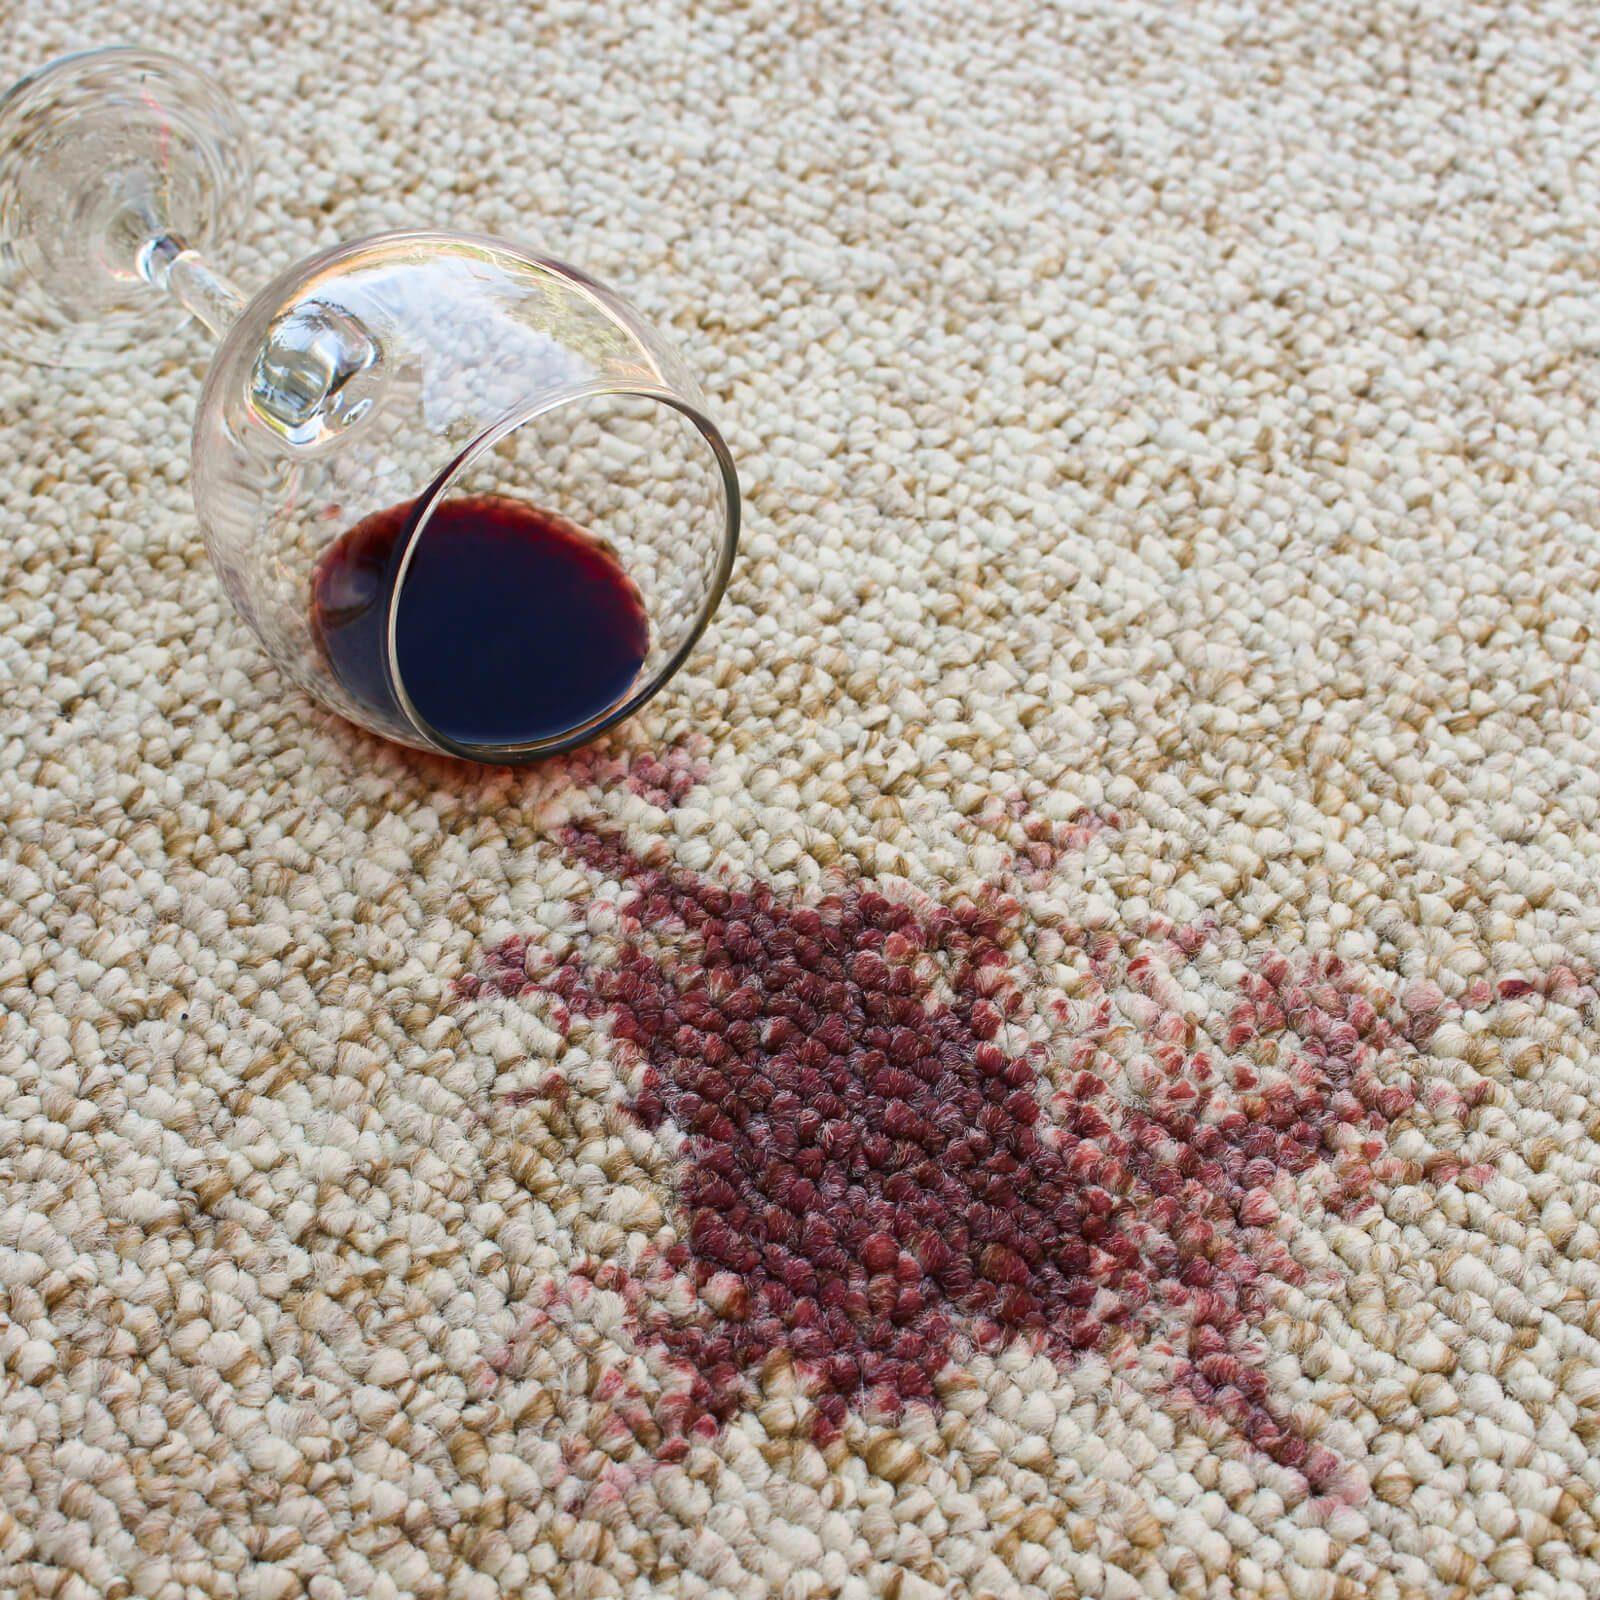 carpet stain wine spill   Haley's Flooring & Interiors